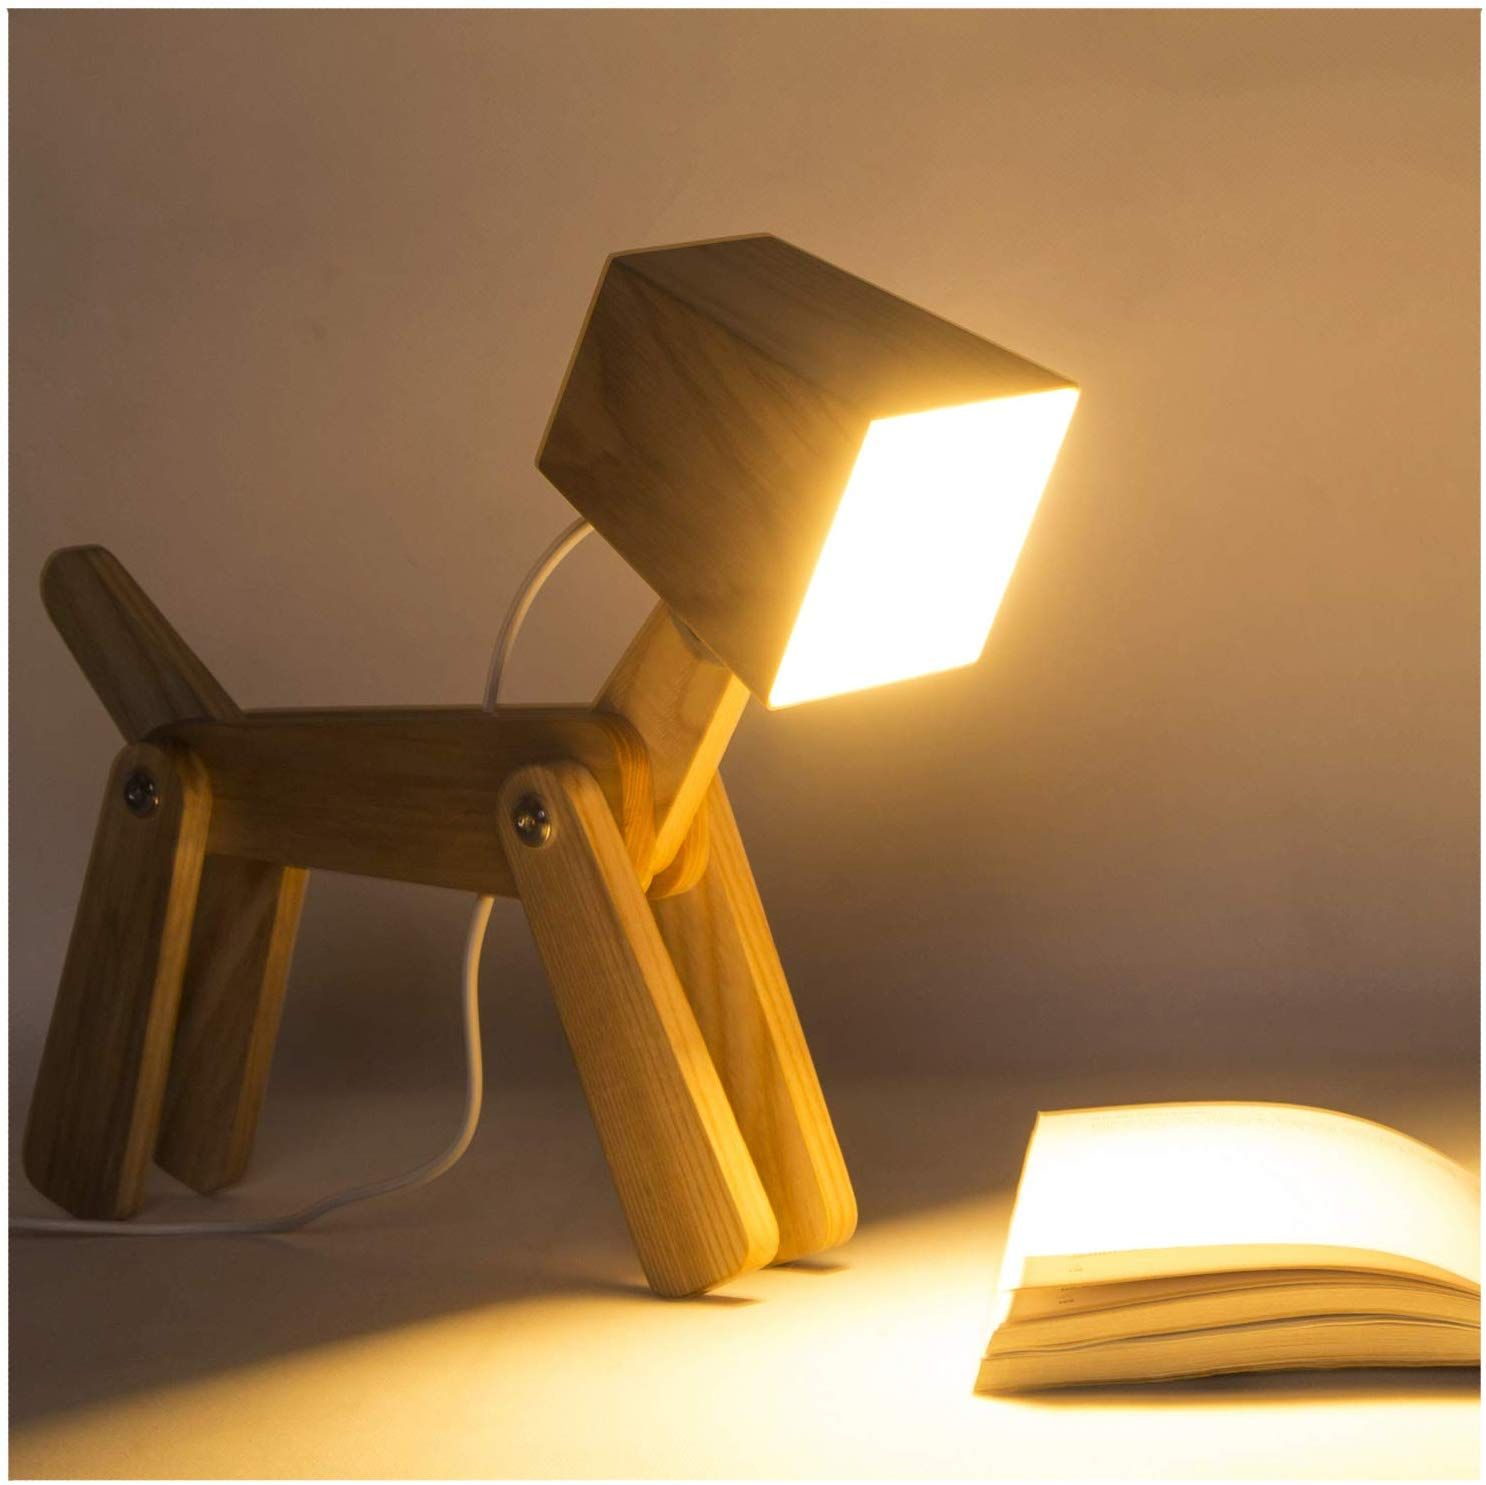 Hroome Modern Design Holz Schreibtischlampe Led Touch Dimmbar Verstellbar Tiere Hund Lampe Dimmer Tischlampe Beleuchtung Fur In 2020 Moderne Lampen Lampen Houten Lamp